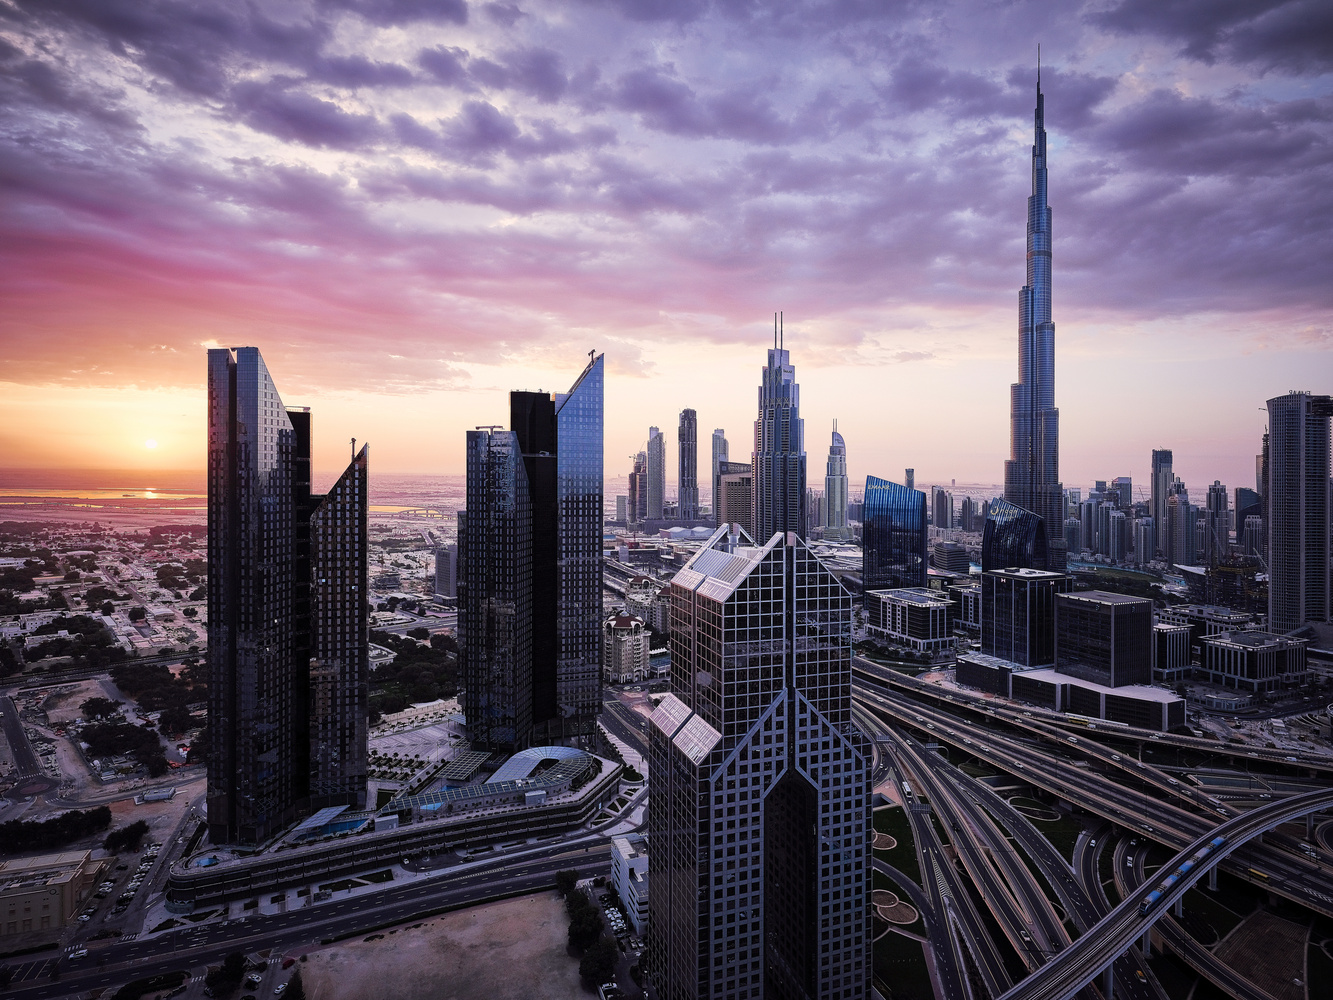 Dubai Sunrise by ivan joshua loh